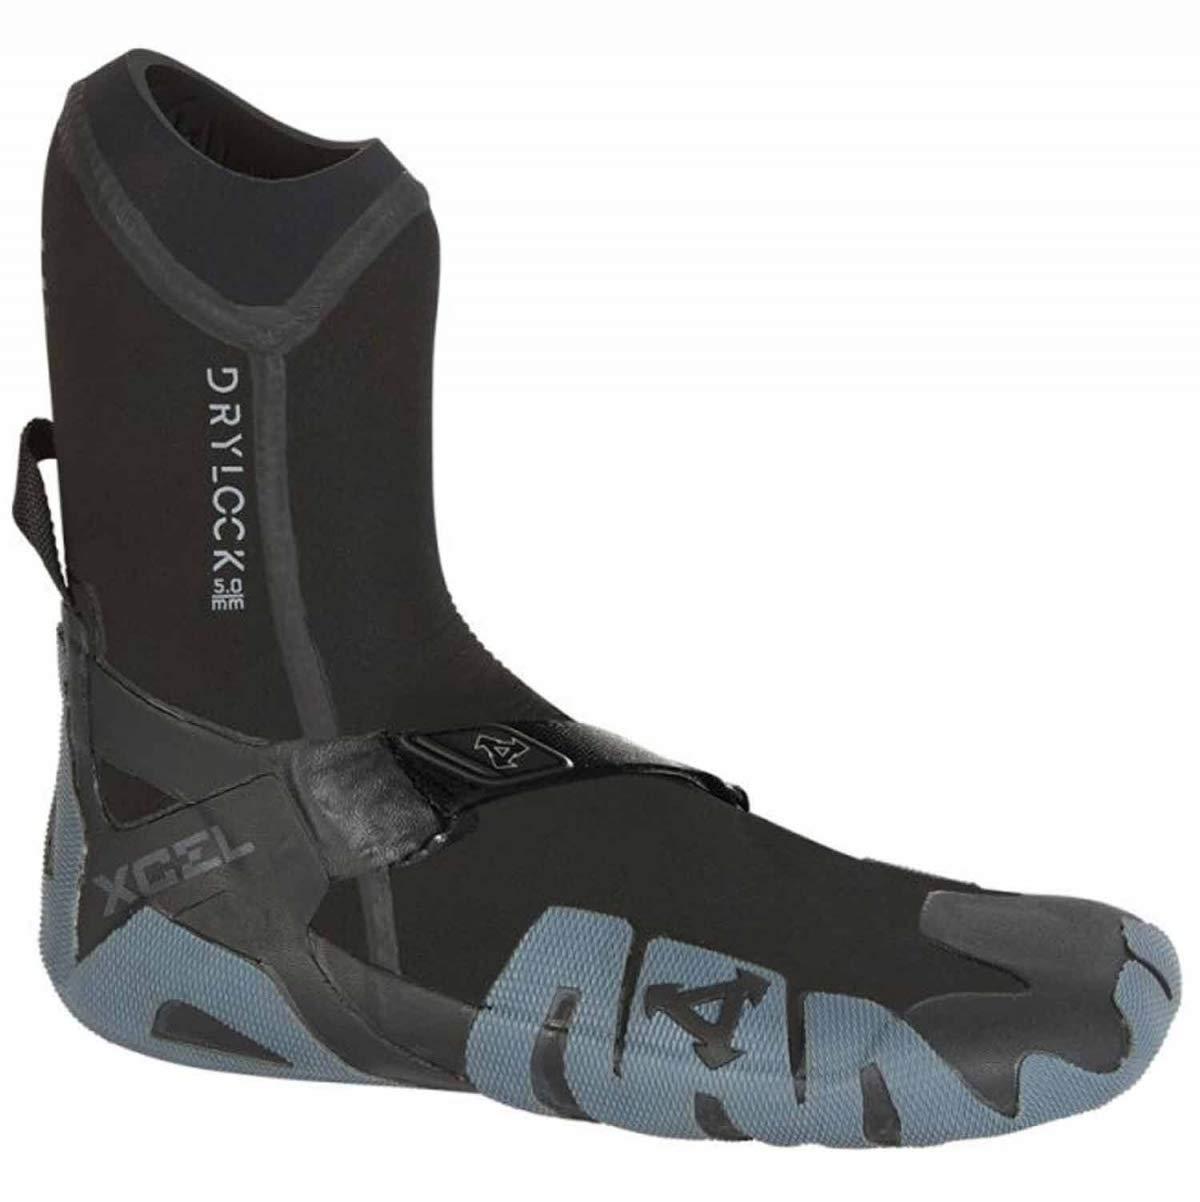 Xcel Fall 2017 Drylock Round Toe Boots, Black/Grey, Size 13/7mm